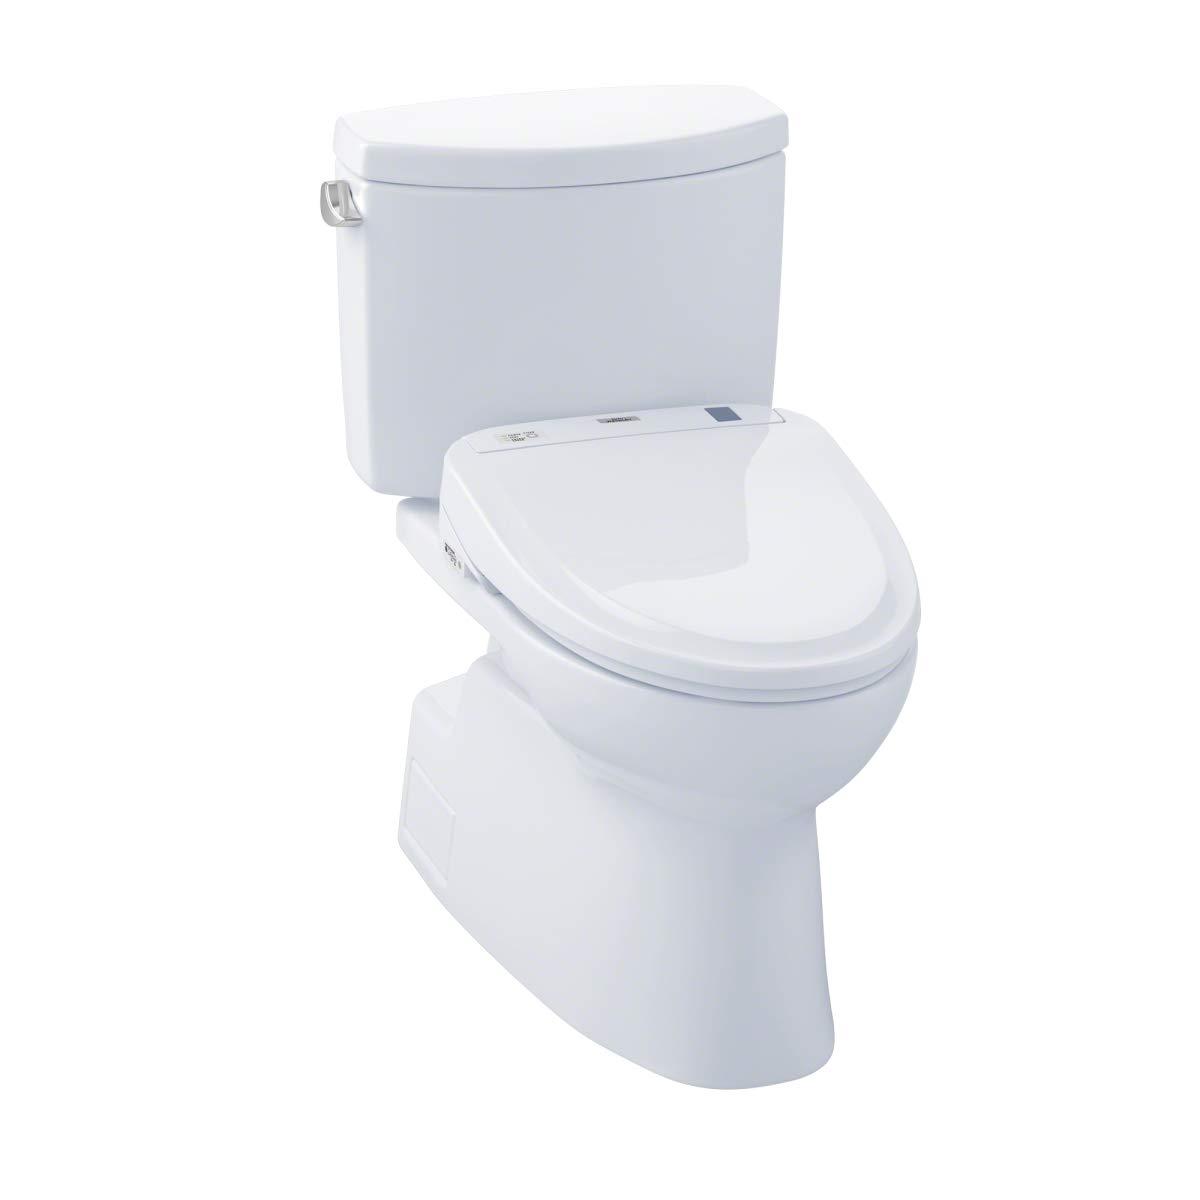 TOTO MW474584CEFG#01 WASHLET+ Vespin II Two-Piece Elongated 1.28 GPF Toilet and WASHLET S350e Bidet Seat, Cotton White